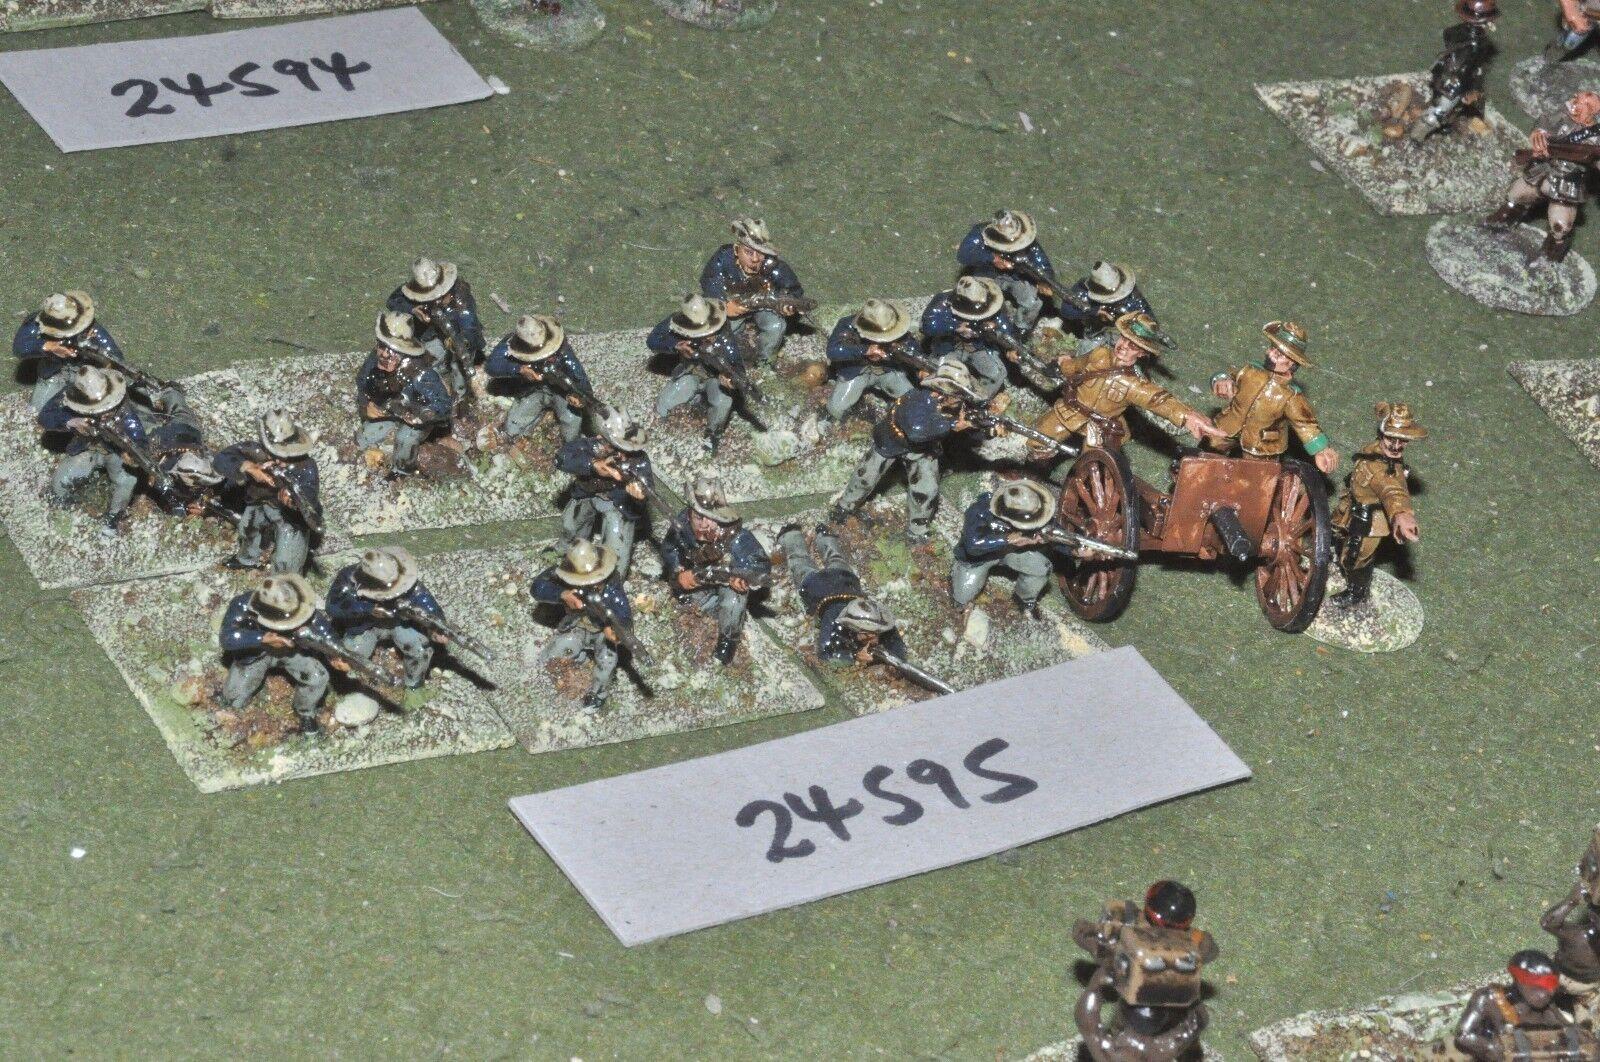 25mm Colonial boers-batalla grupo 24 figuras-INF (24595)